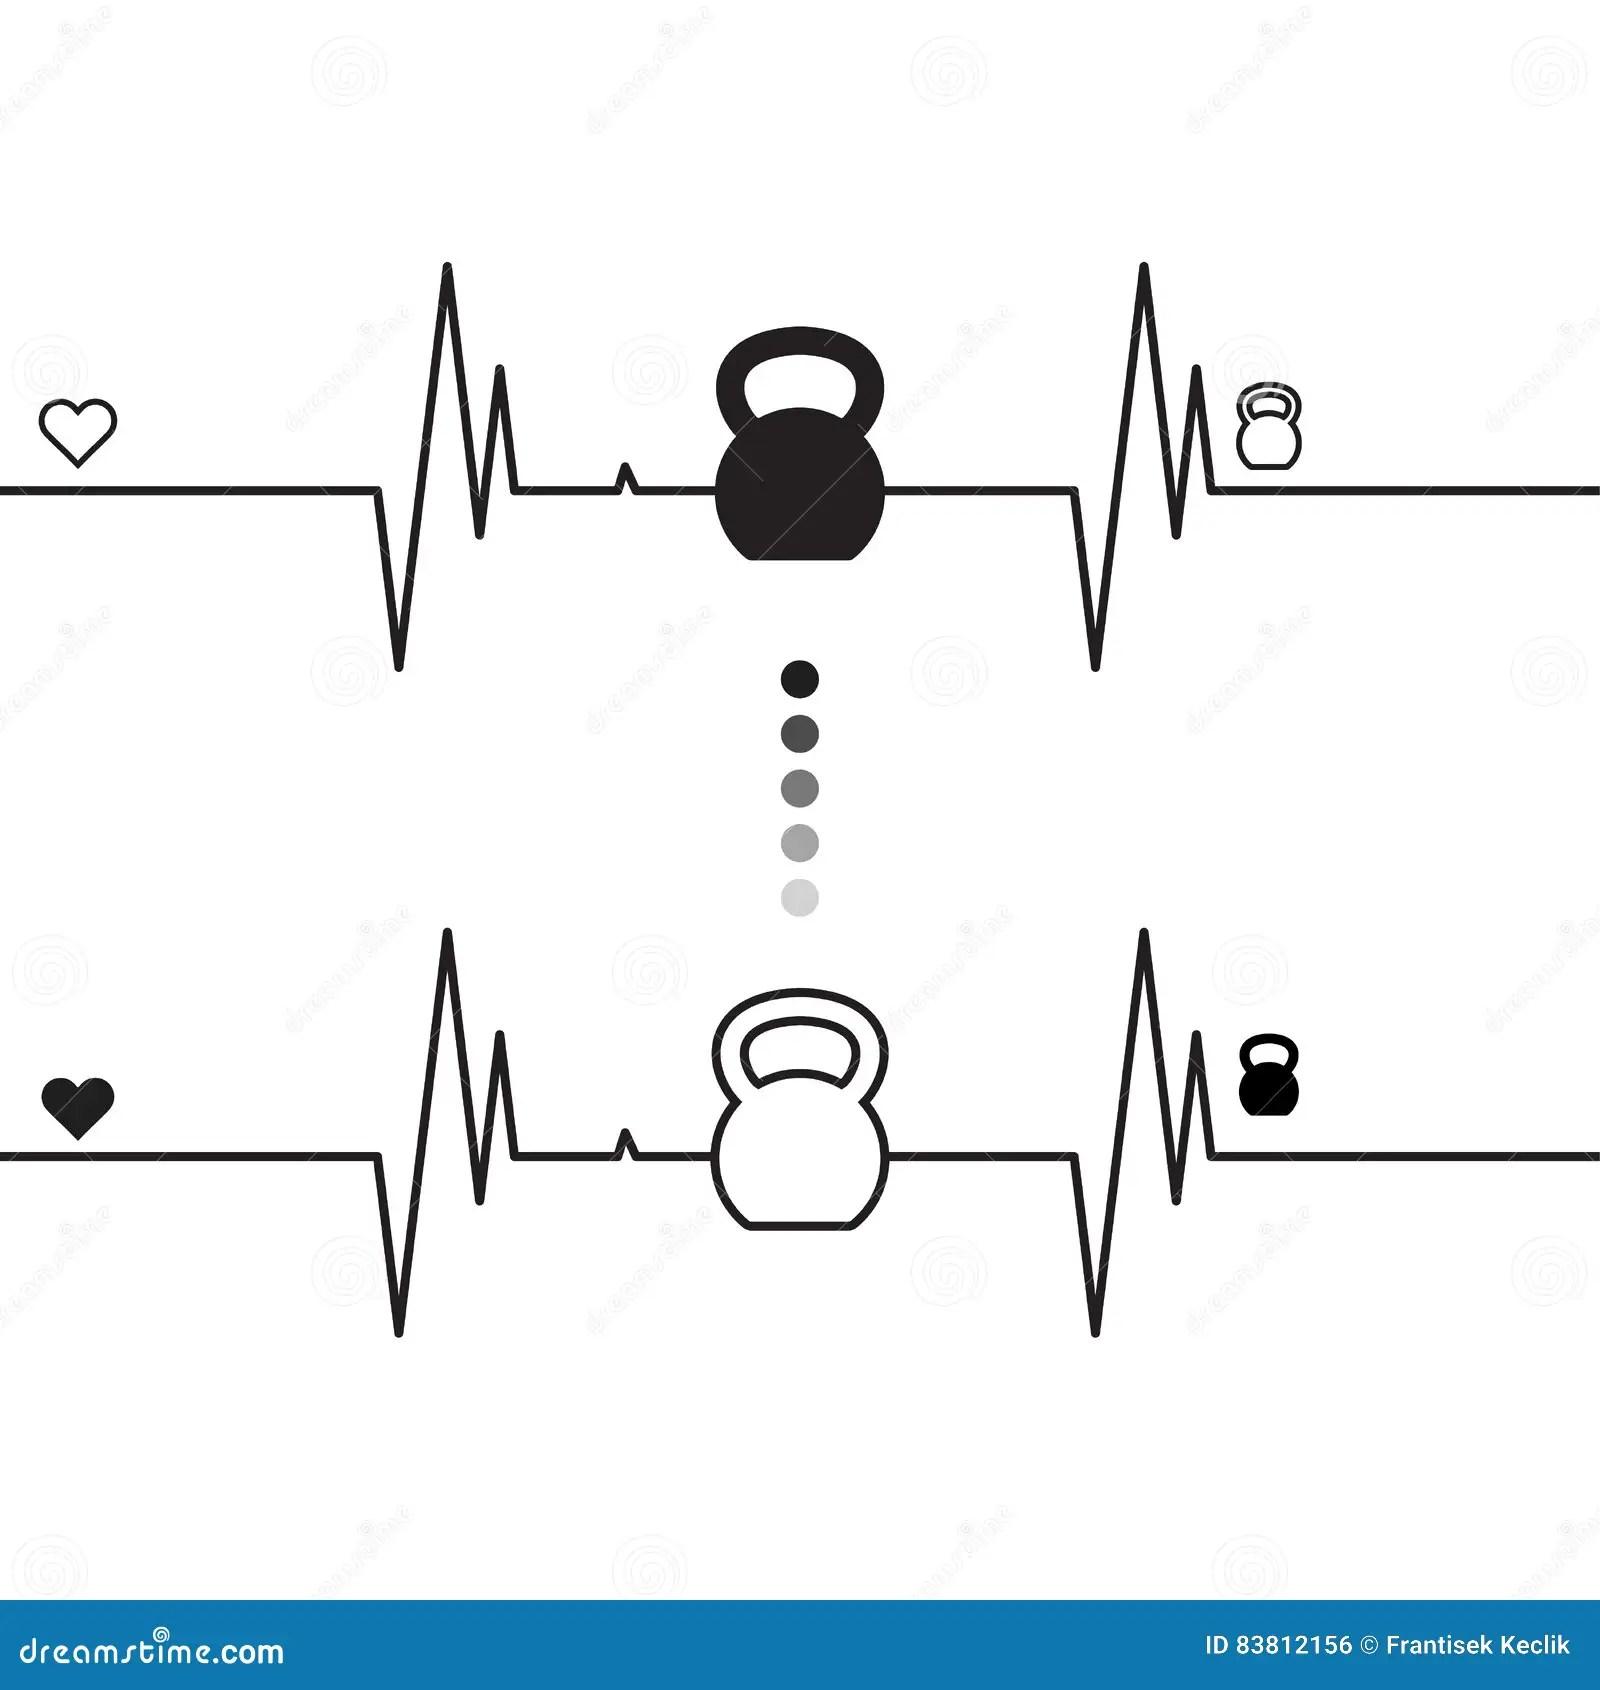 electrocardiogram diagram